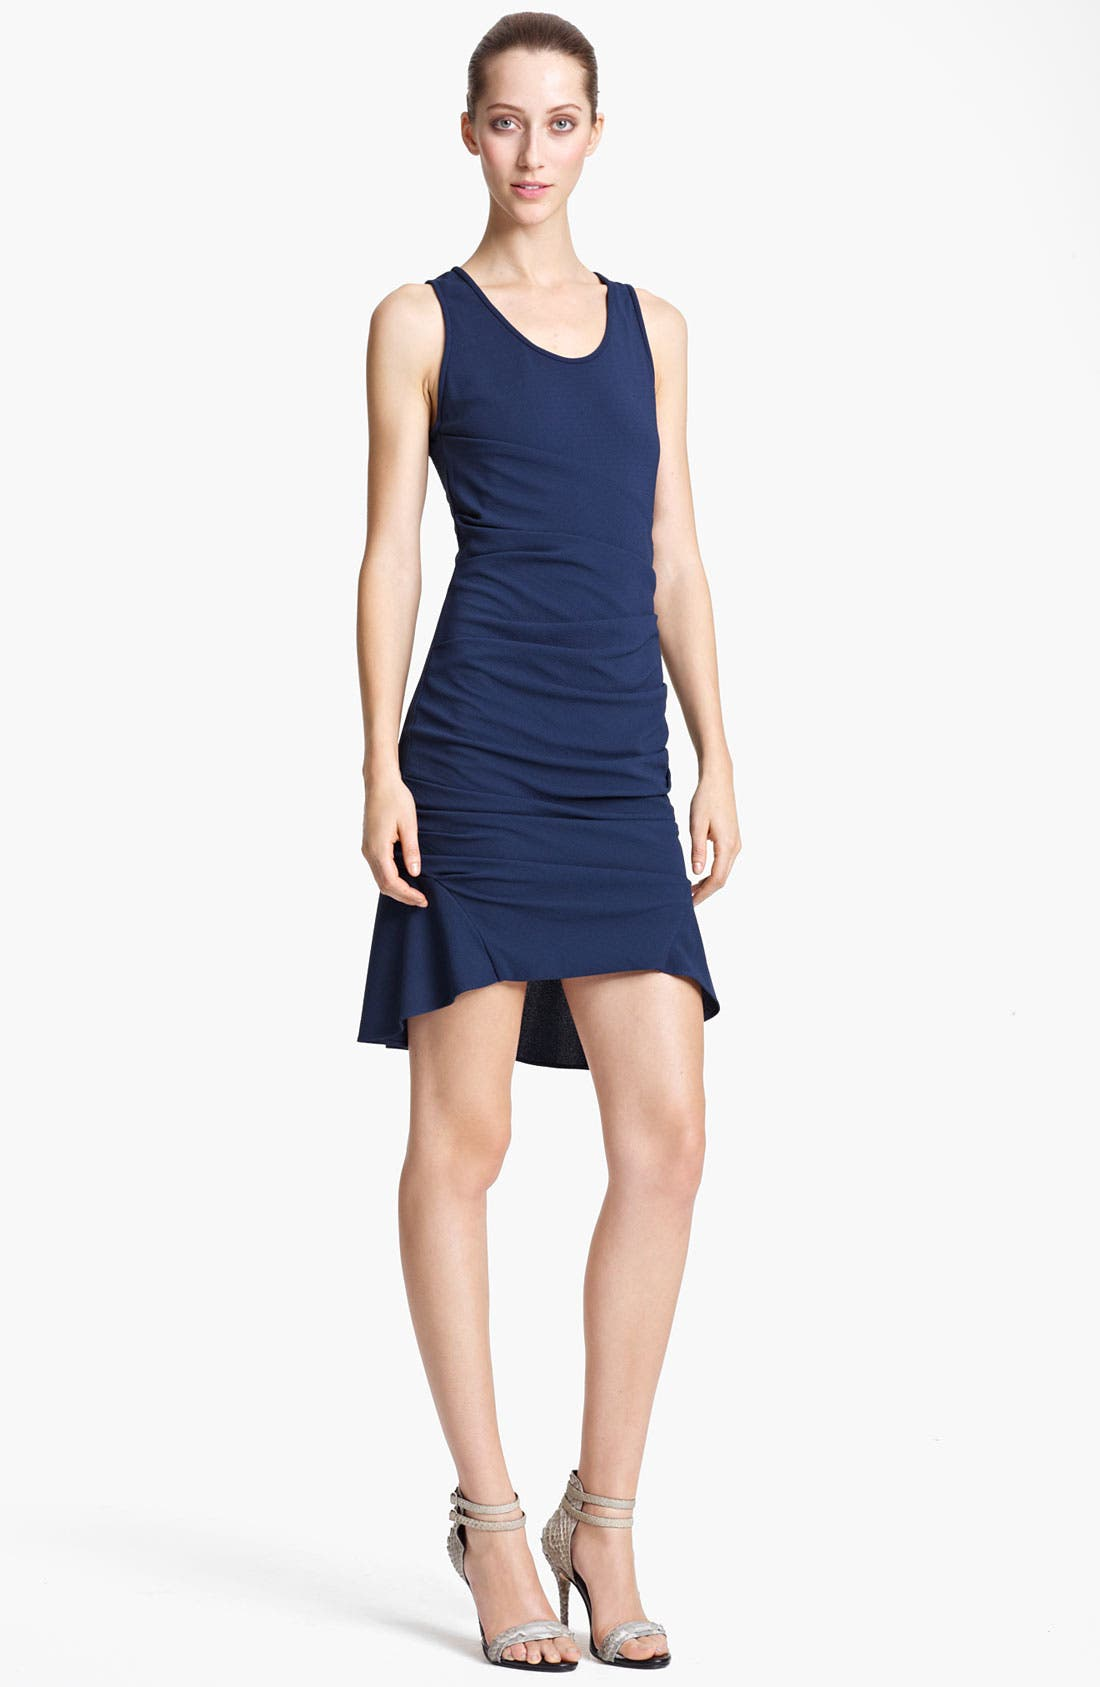 Alternate Image 1 Selected - Yigal Azrouël Matte Crepe Jersey Dress